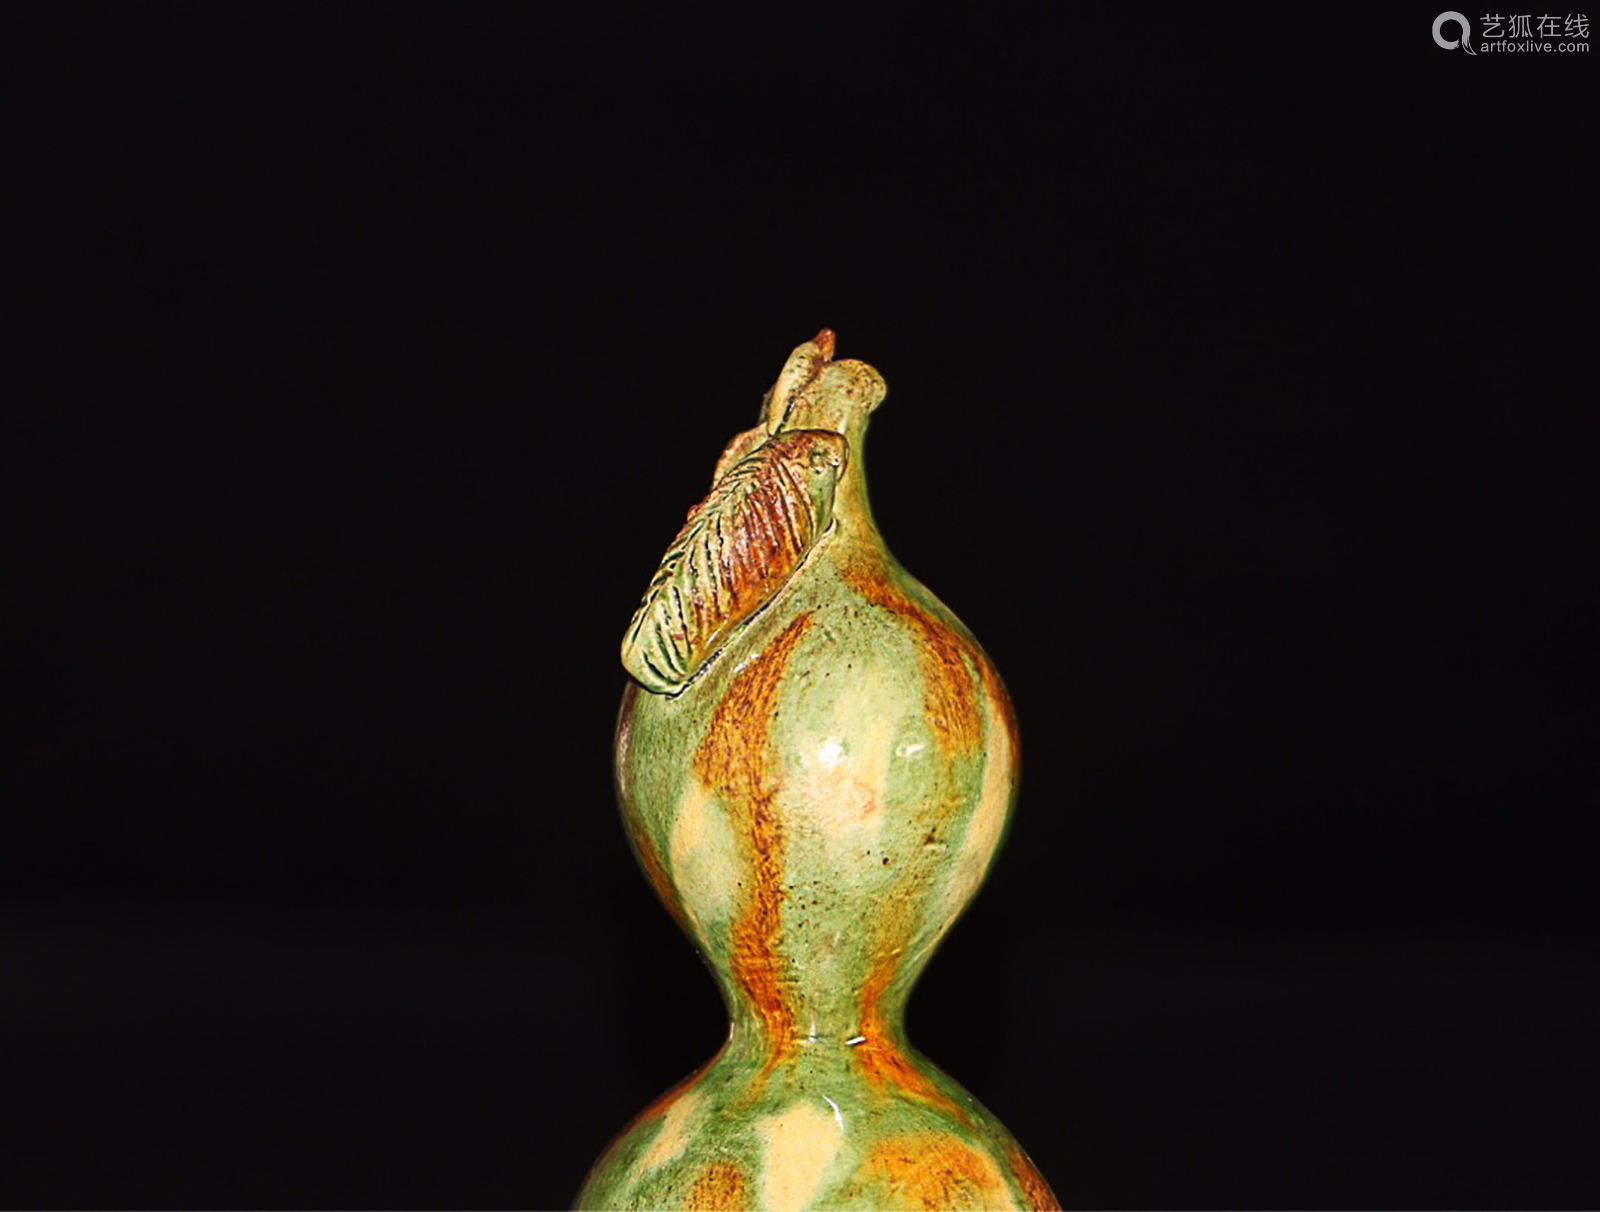 A GOURD DESIGN TANG TRI-COLOR GLAZED ORNAMENT